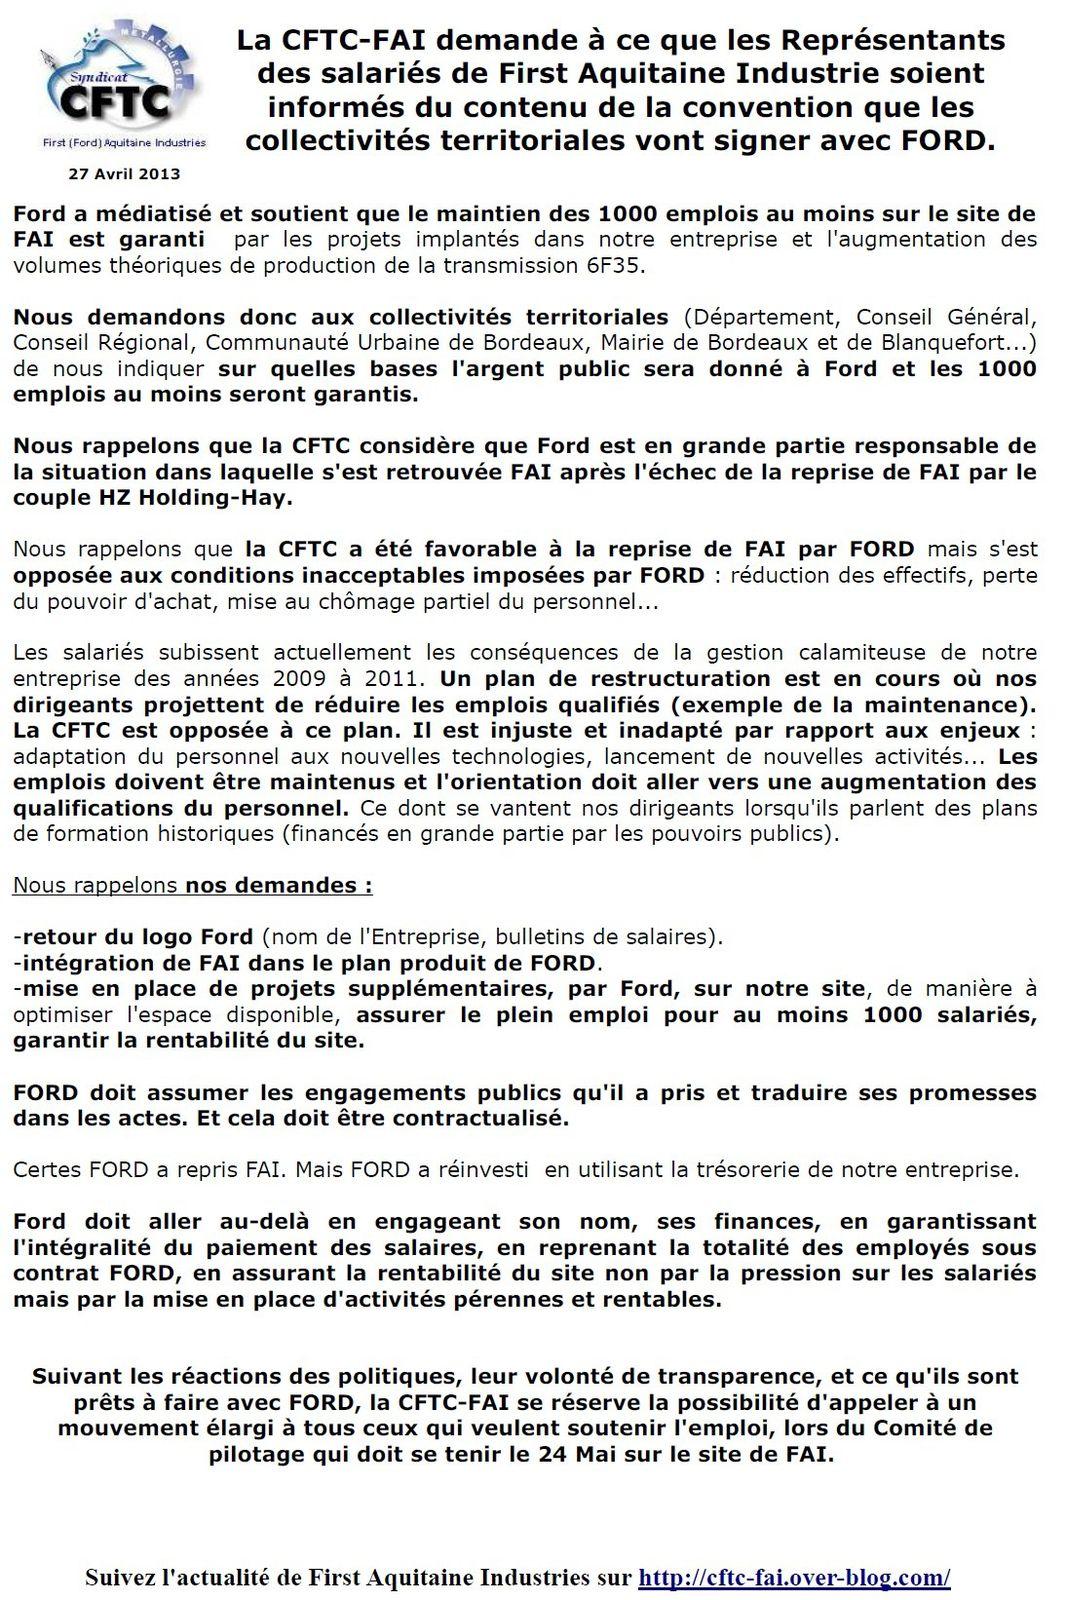 Demand convention 27 04 2013